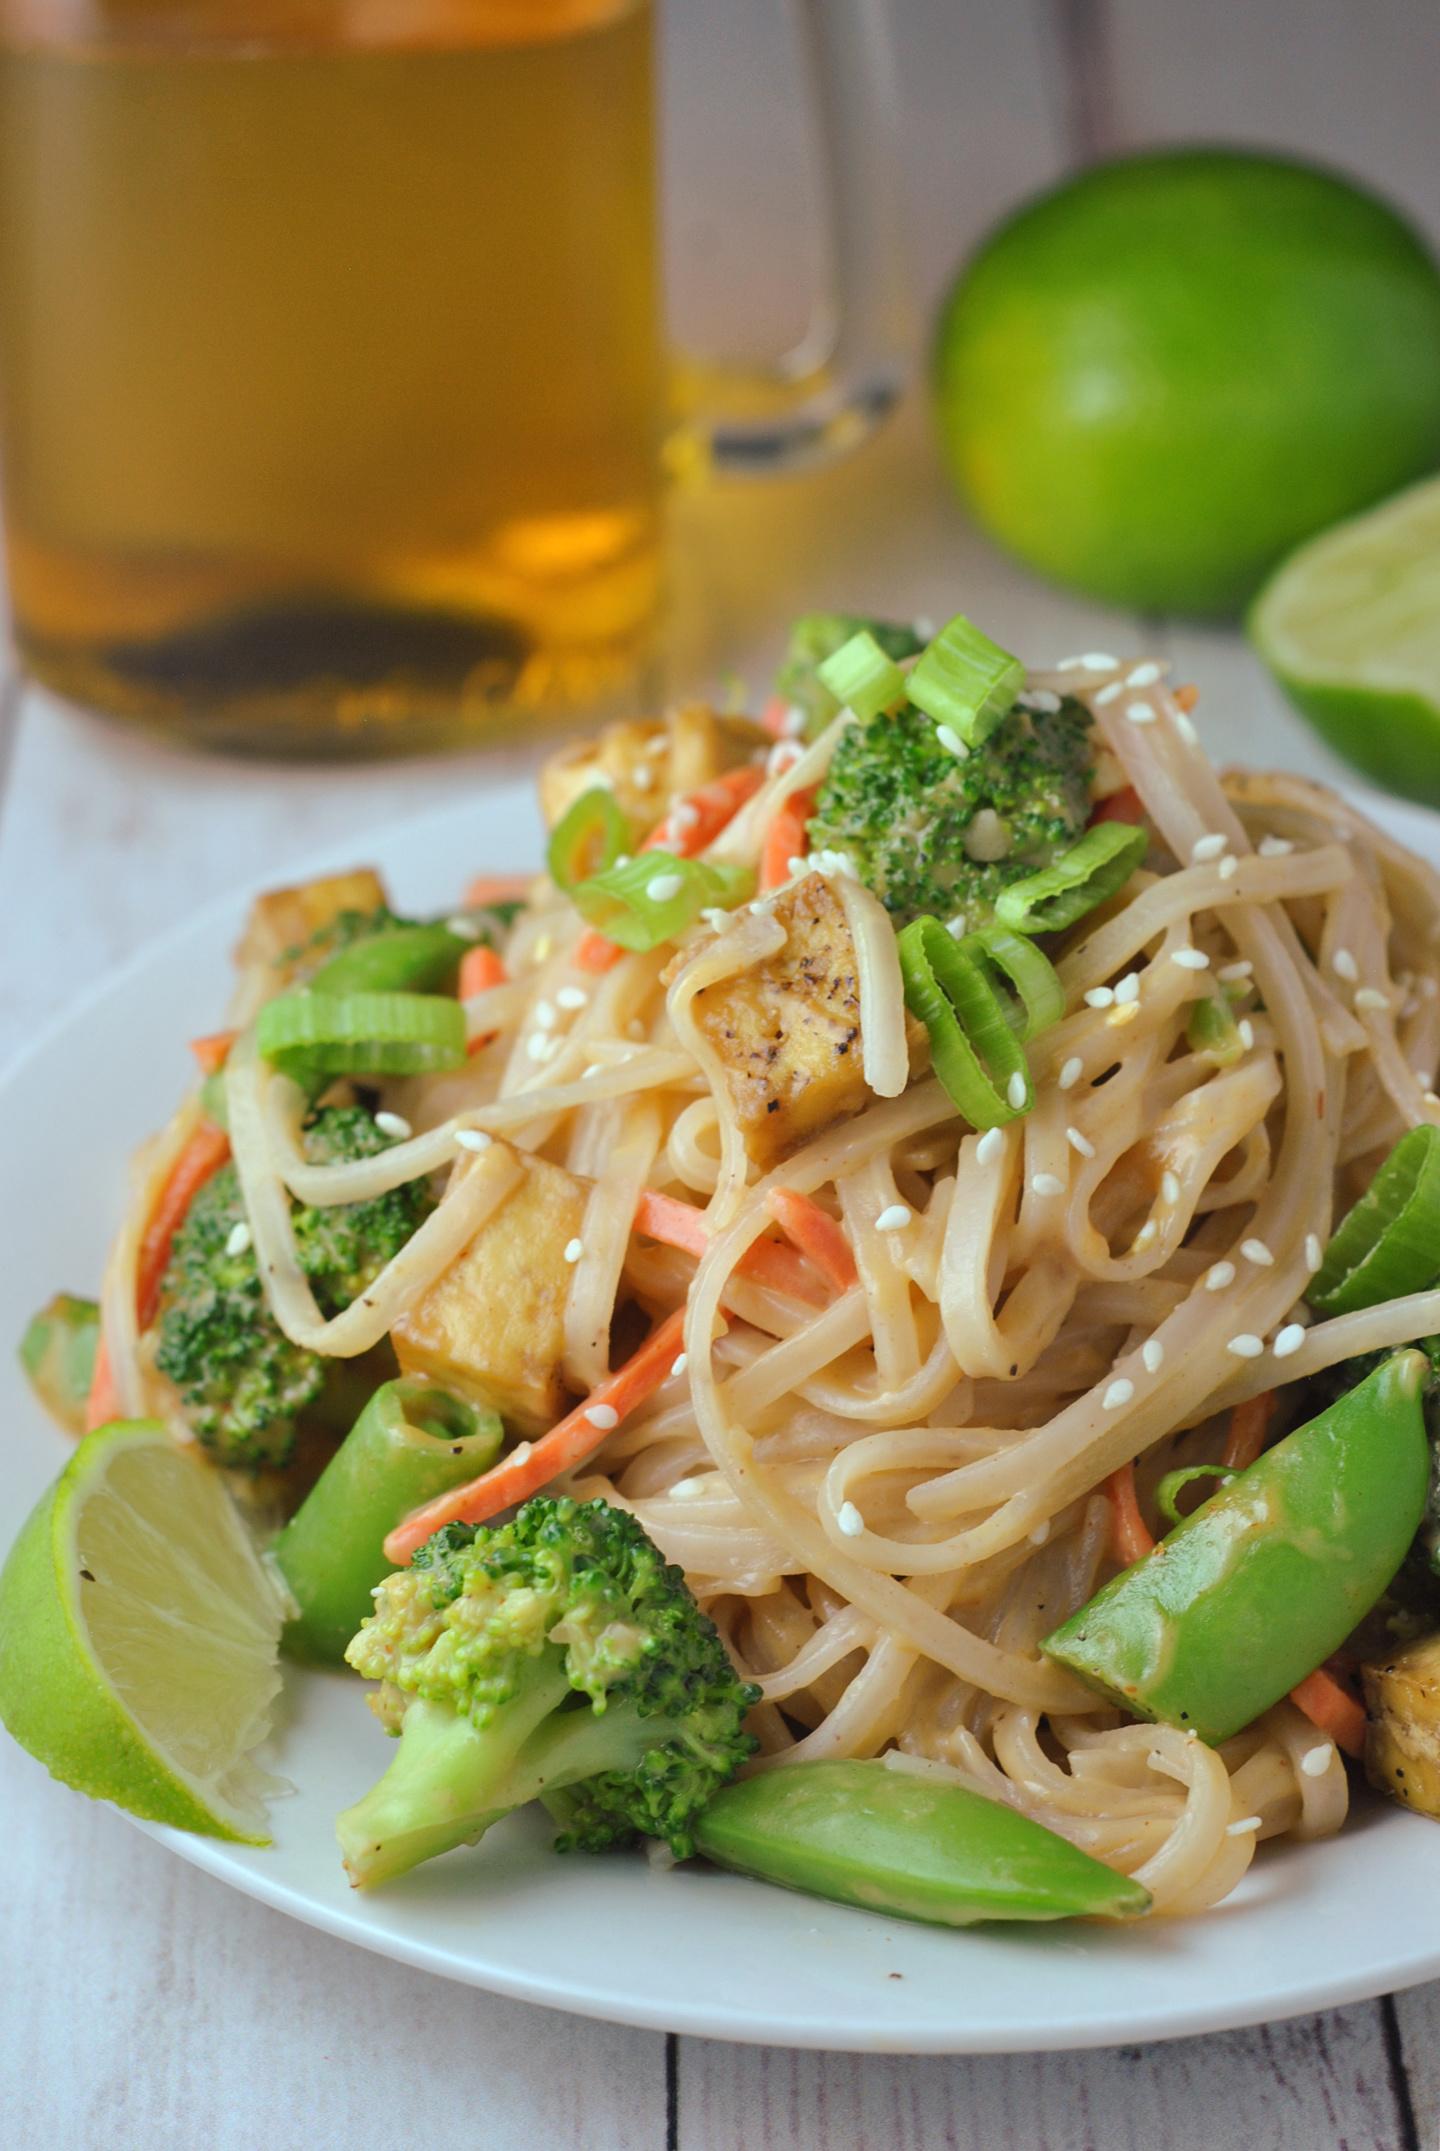 Peanut Sauce Rice Noodles with Tofu and Veggies via @preventionrd